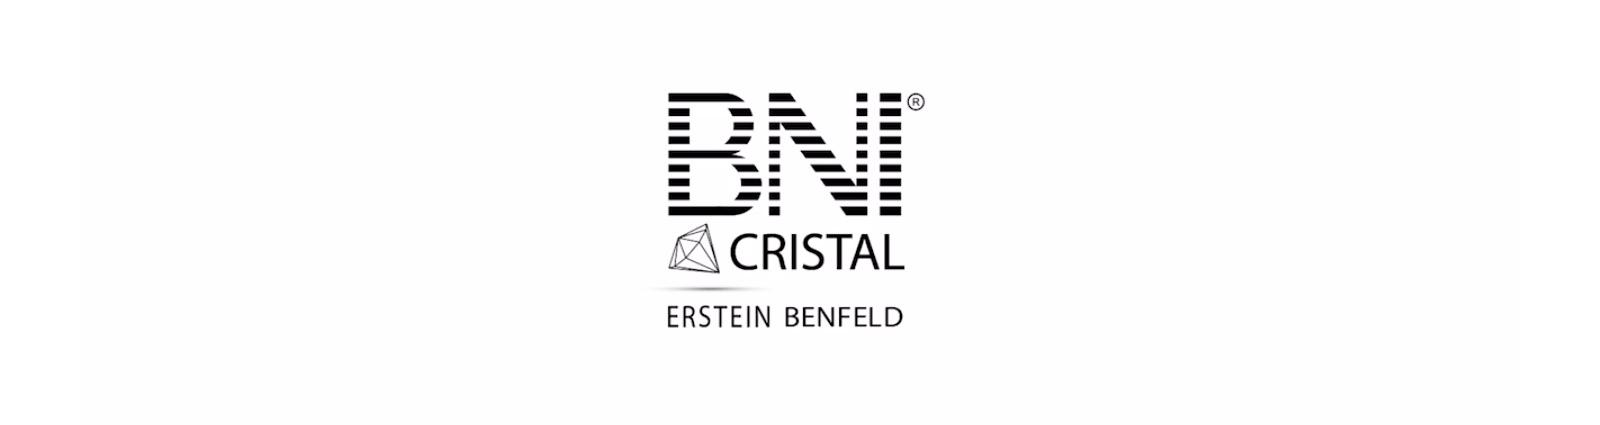 bni cristal